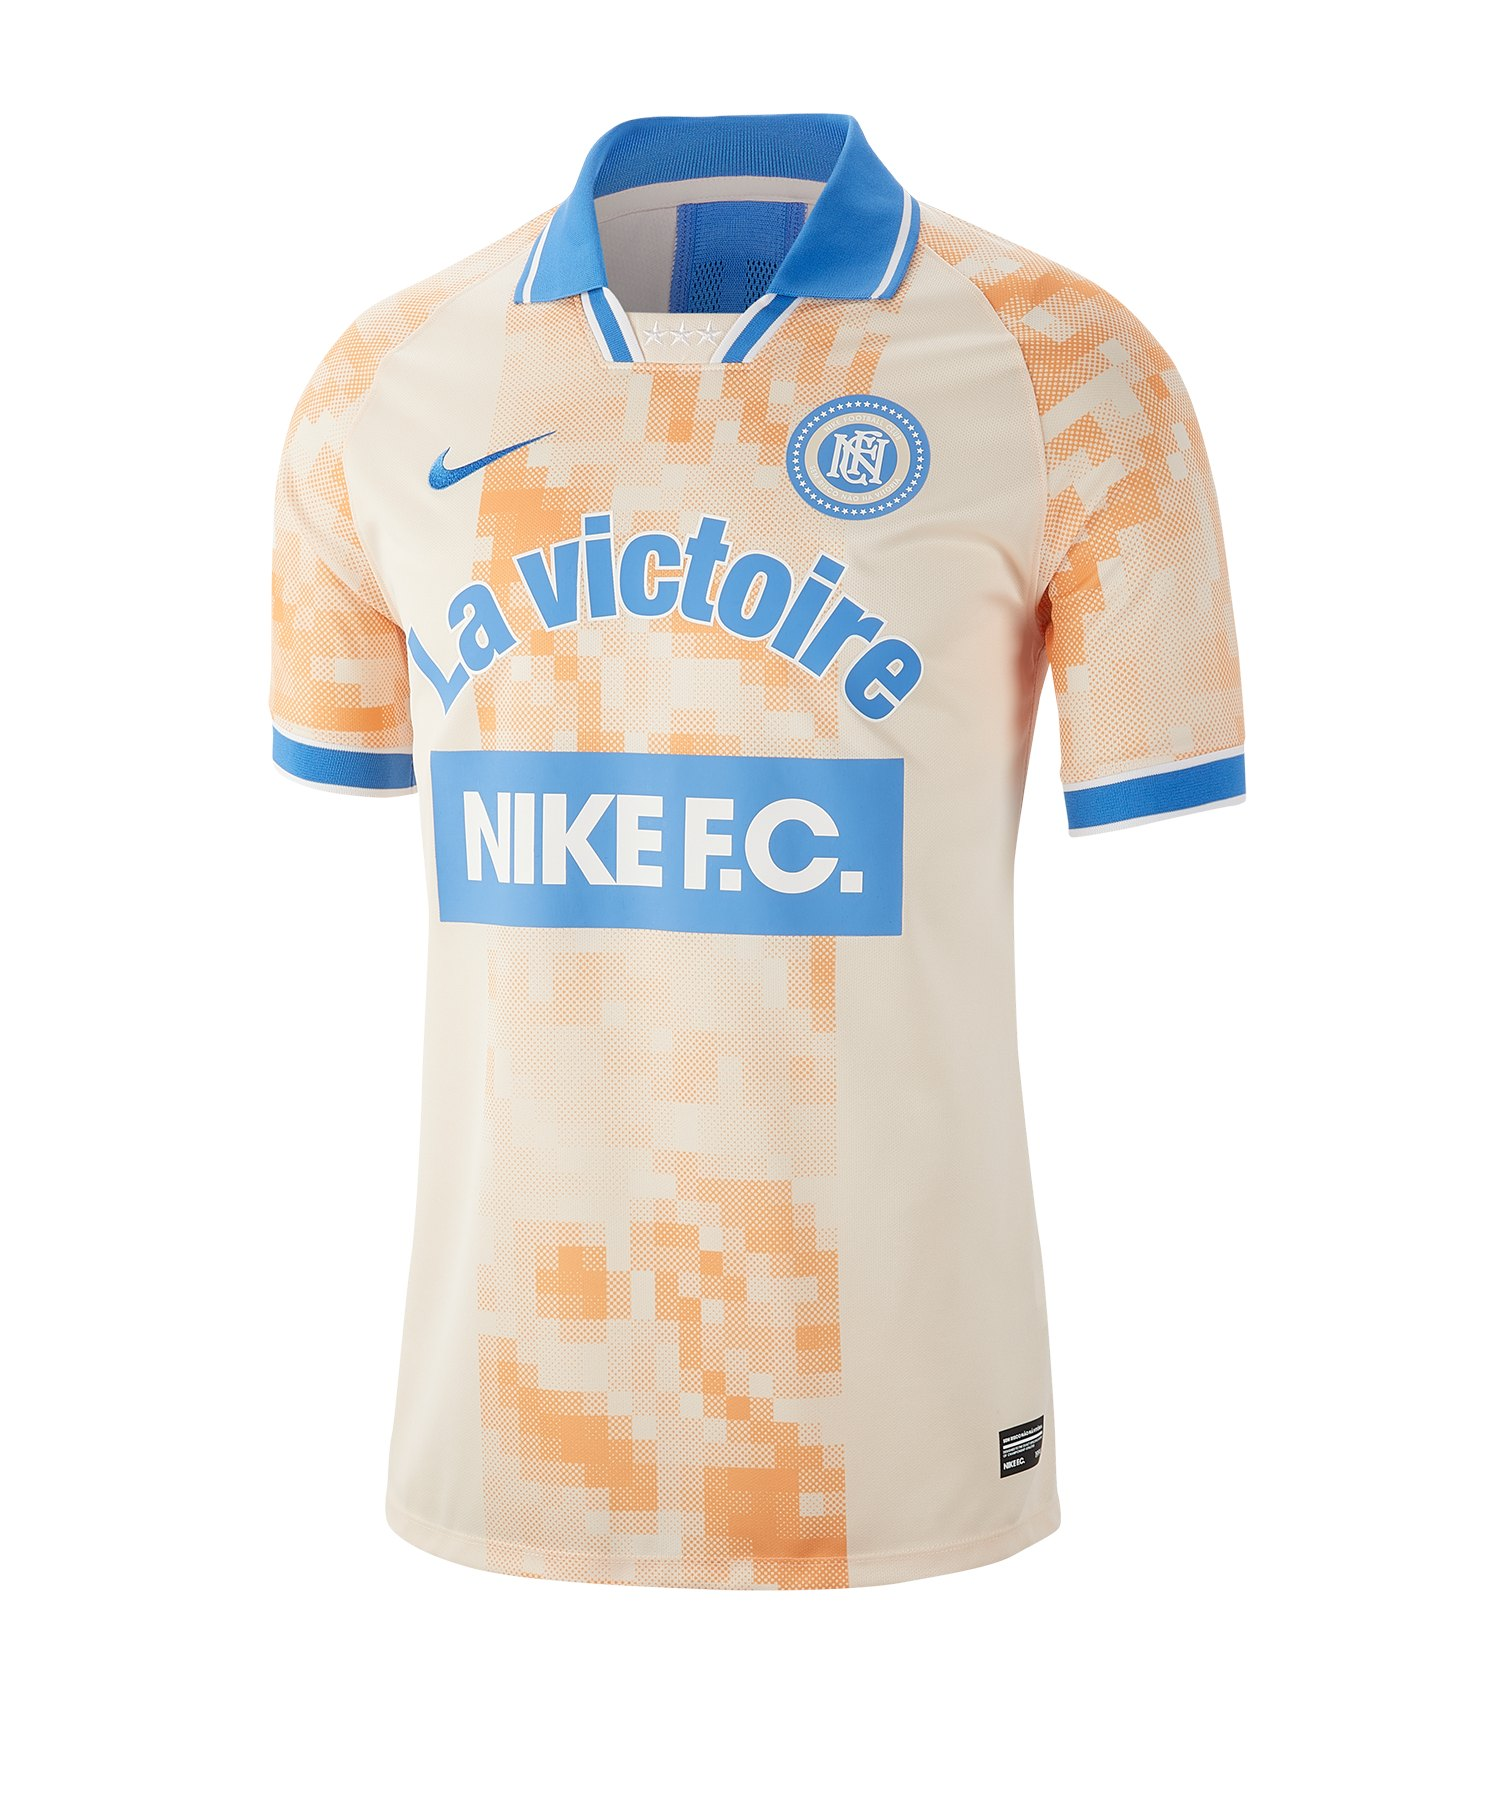 Nike F.C. Frankreich Jersey T-Shirt Orange F838 - Orange